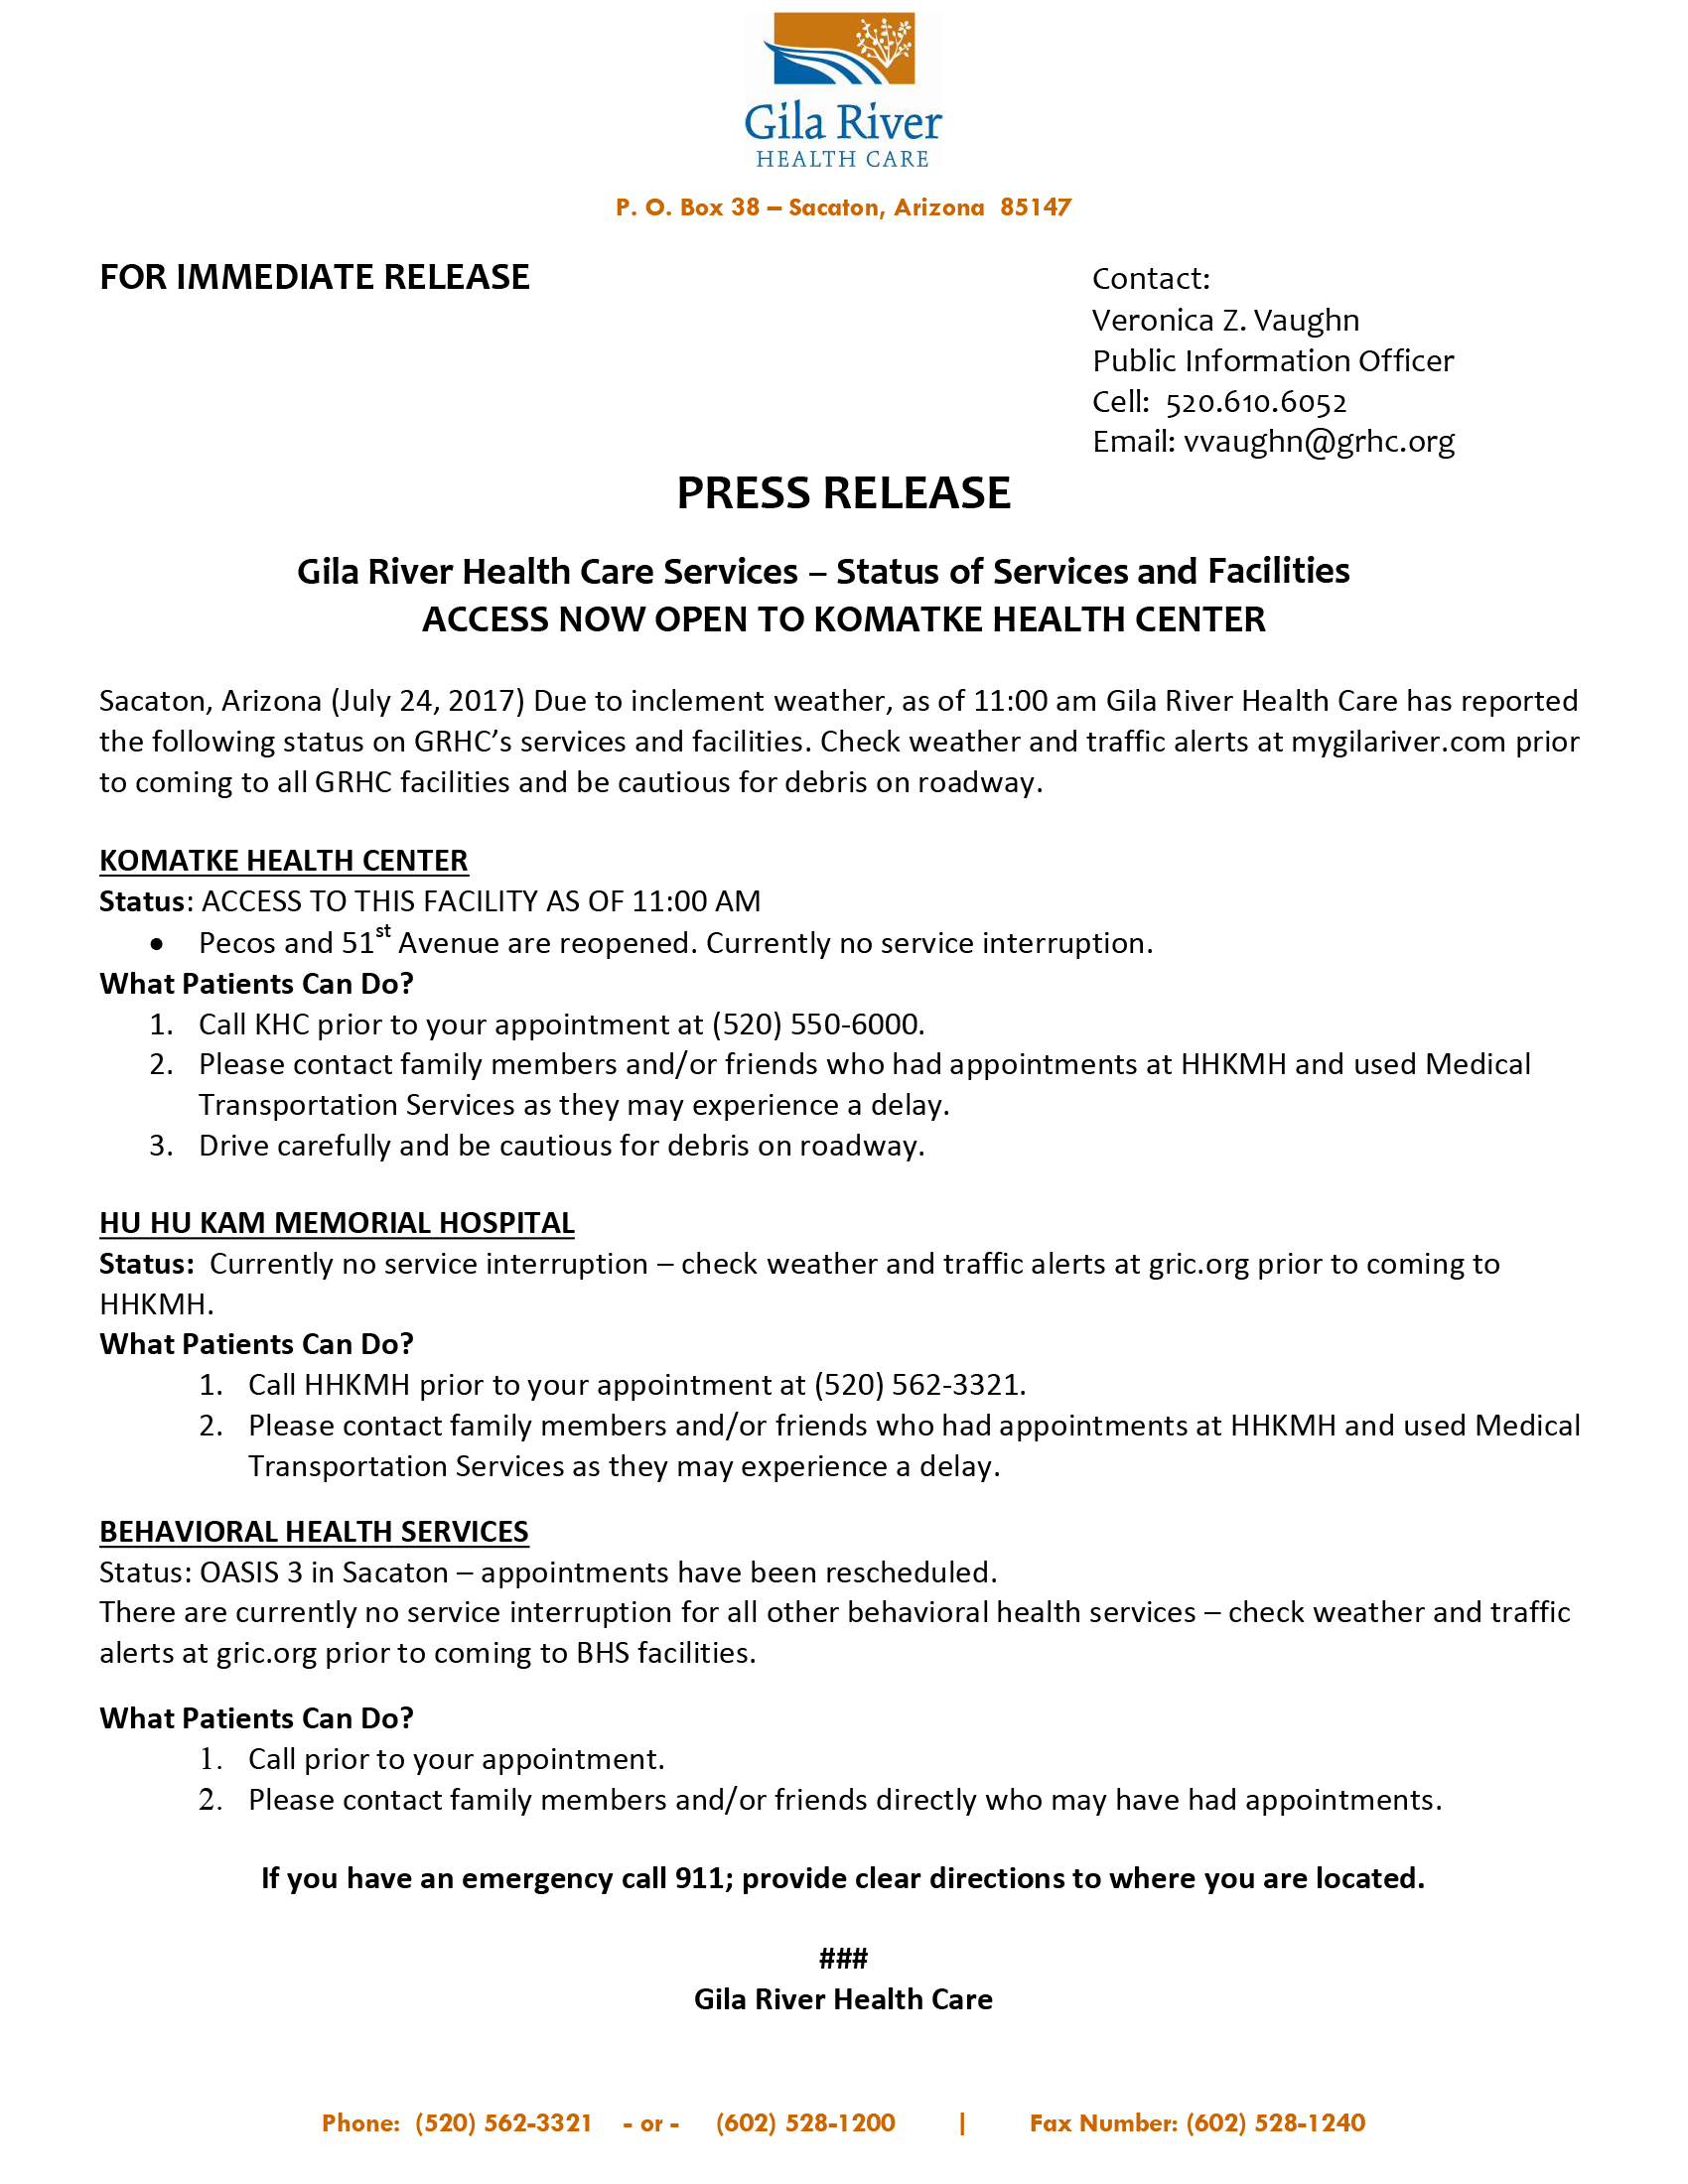 GRHC Press Release 7/24/17